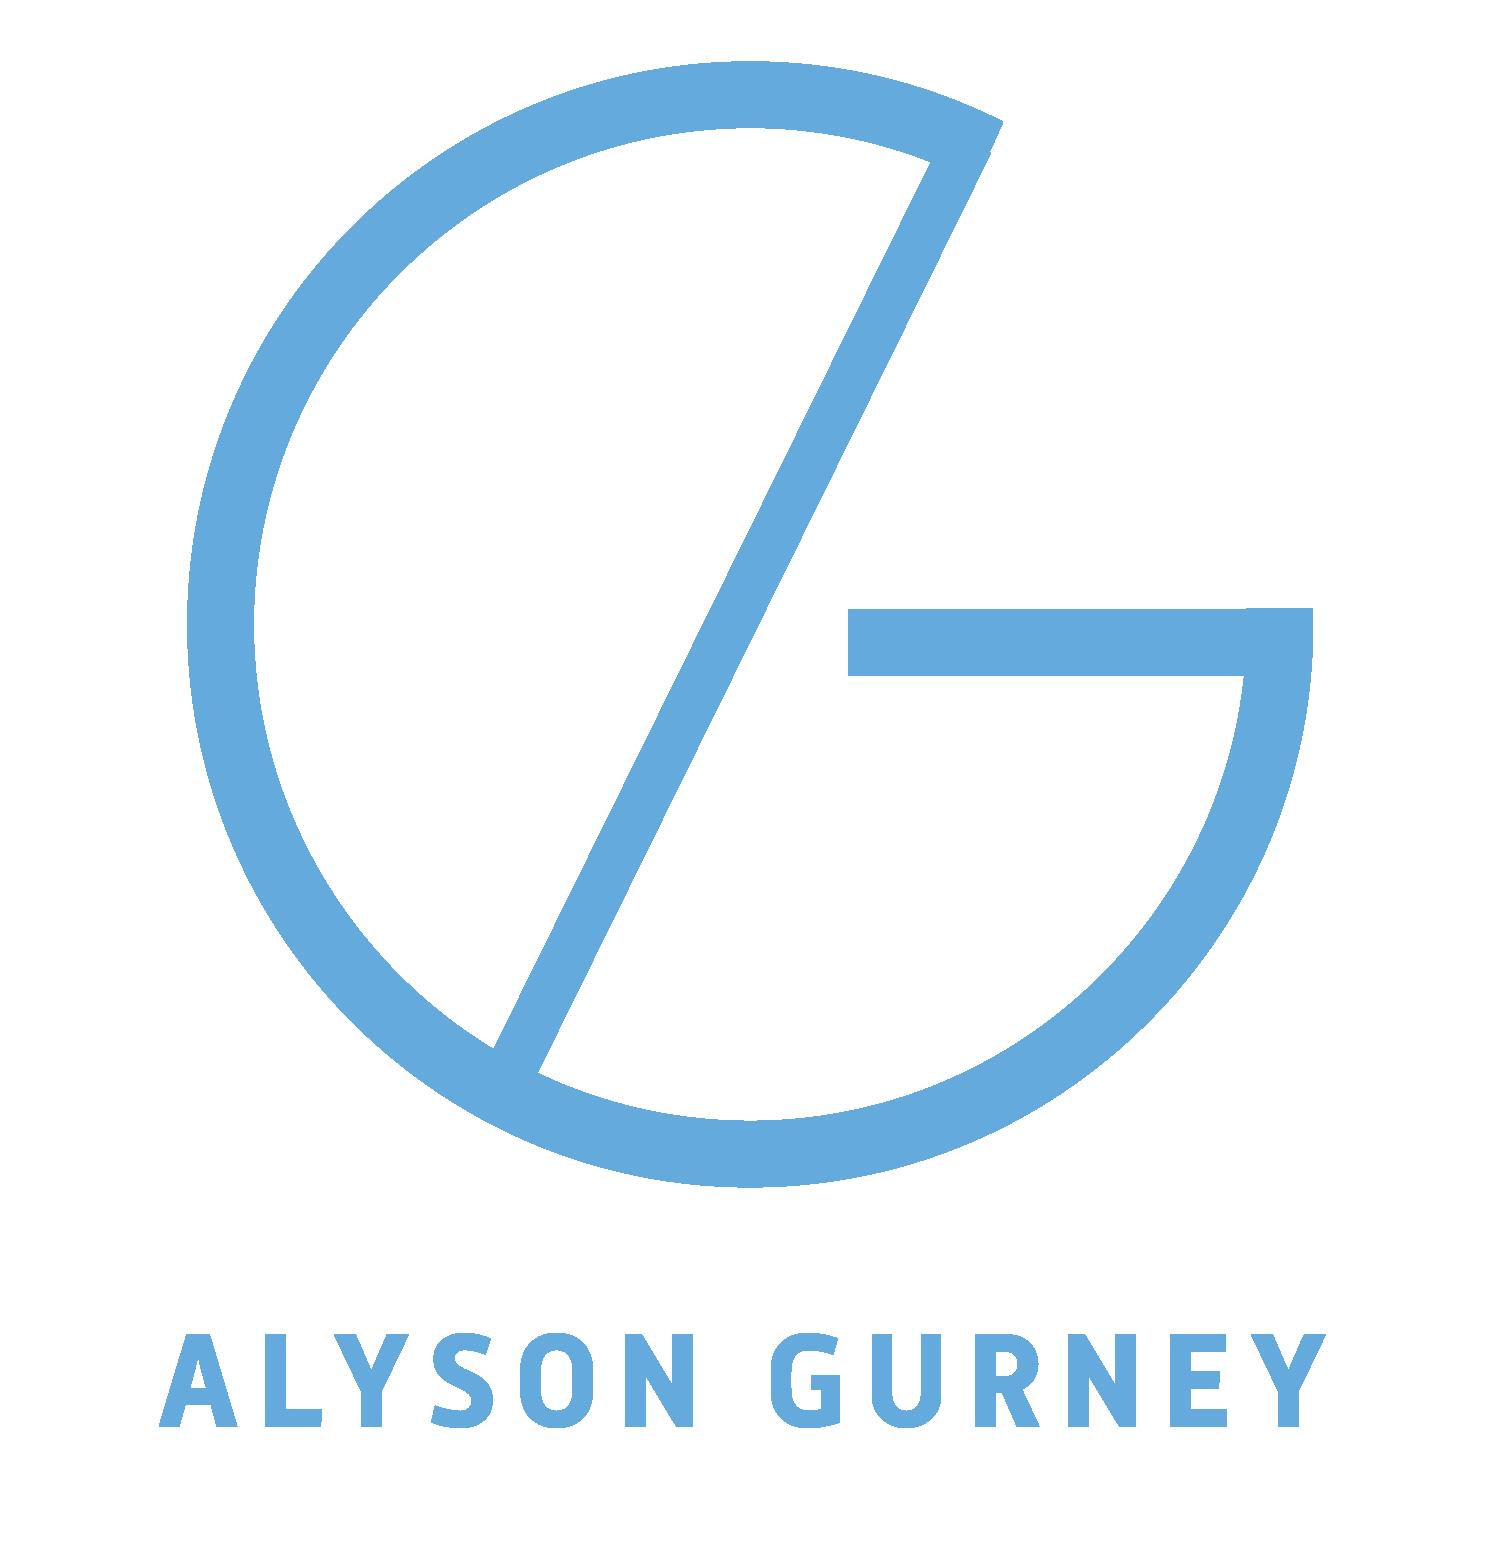 Alyson Gurney